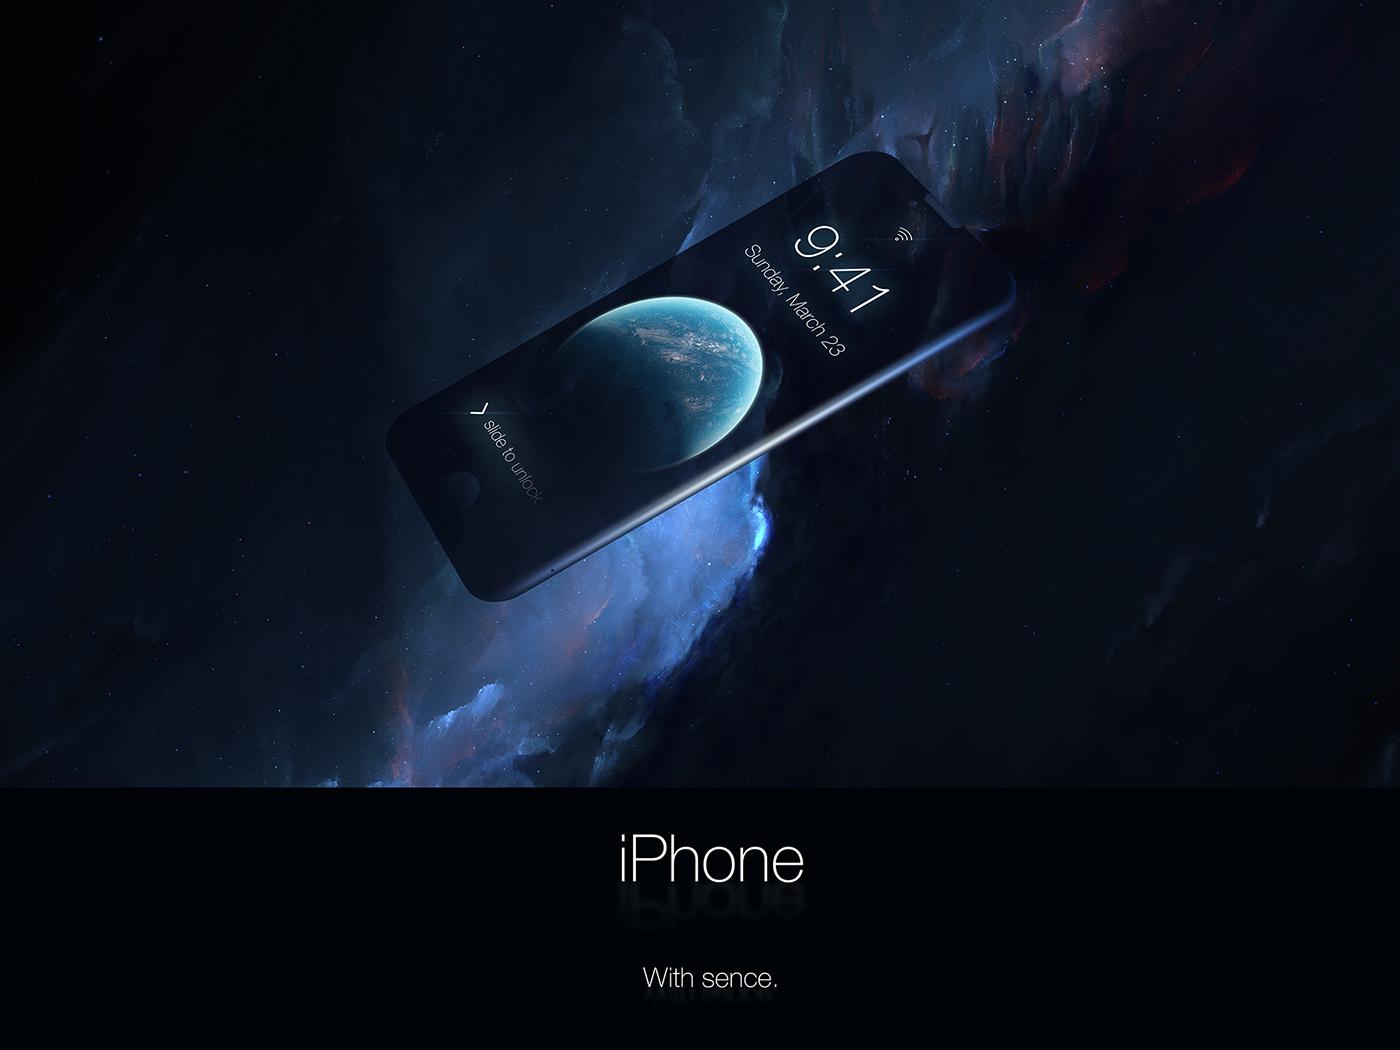 iphone-7-vashey-mechtyi-kontsept